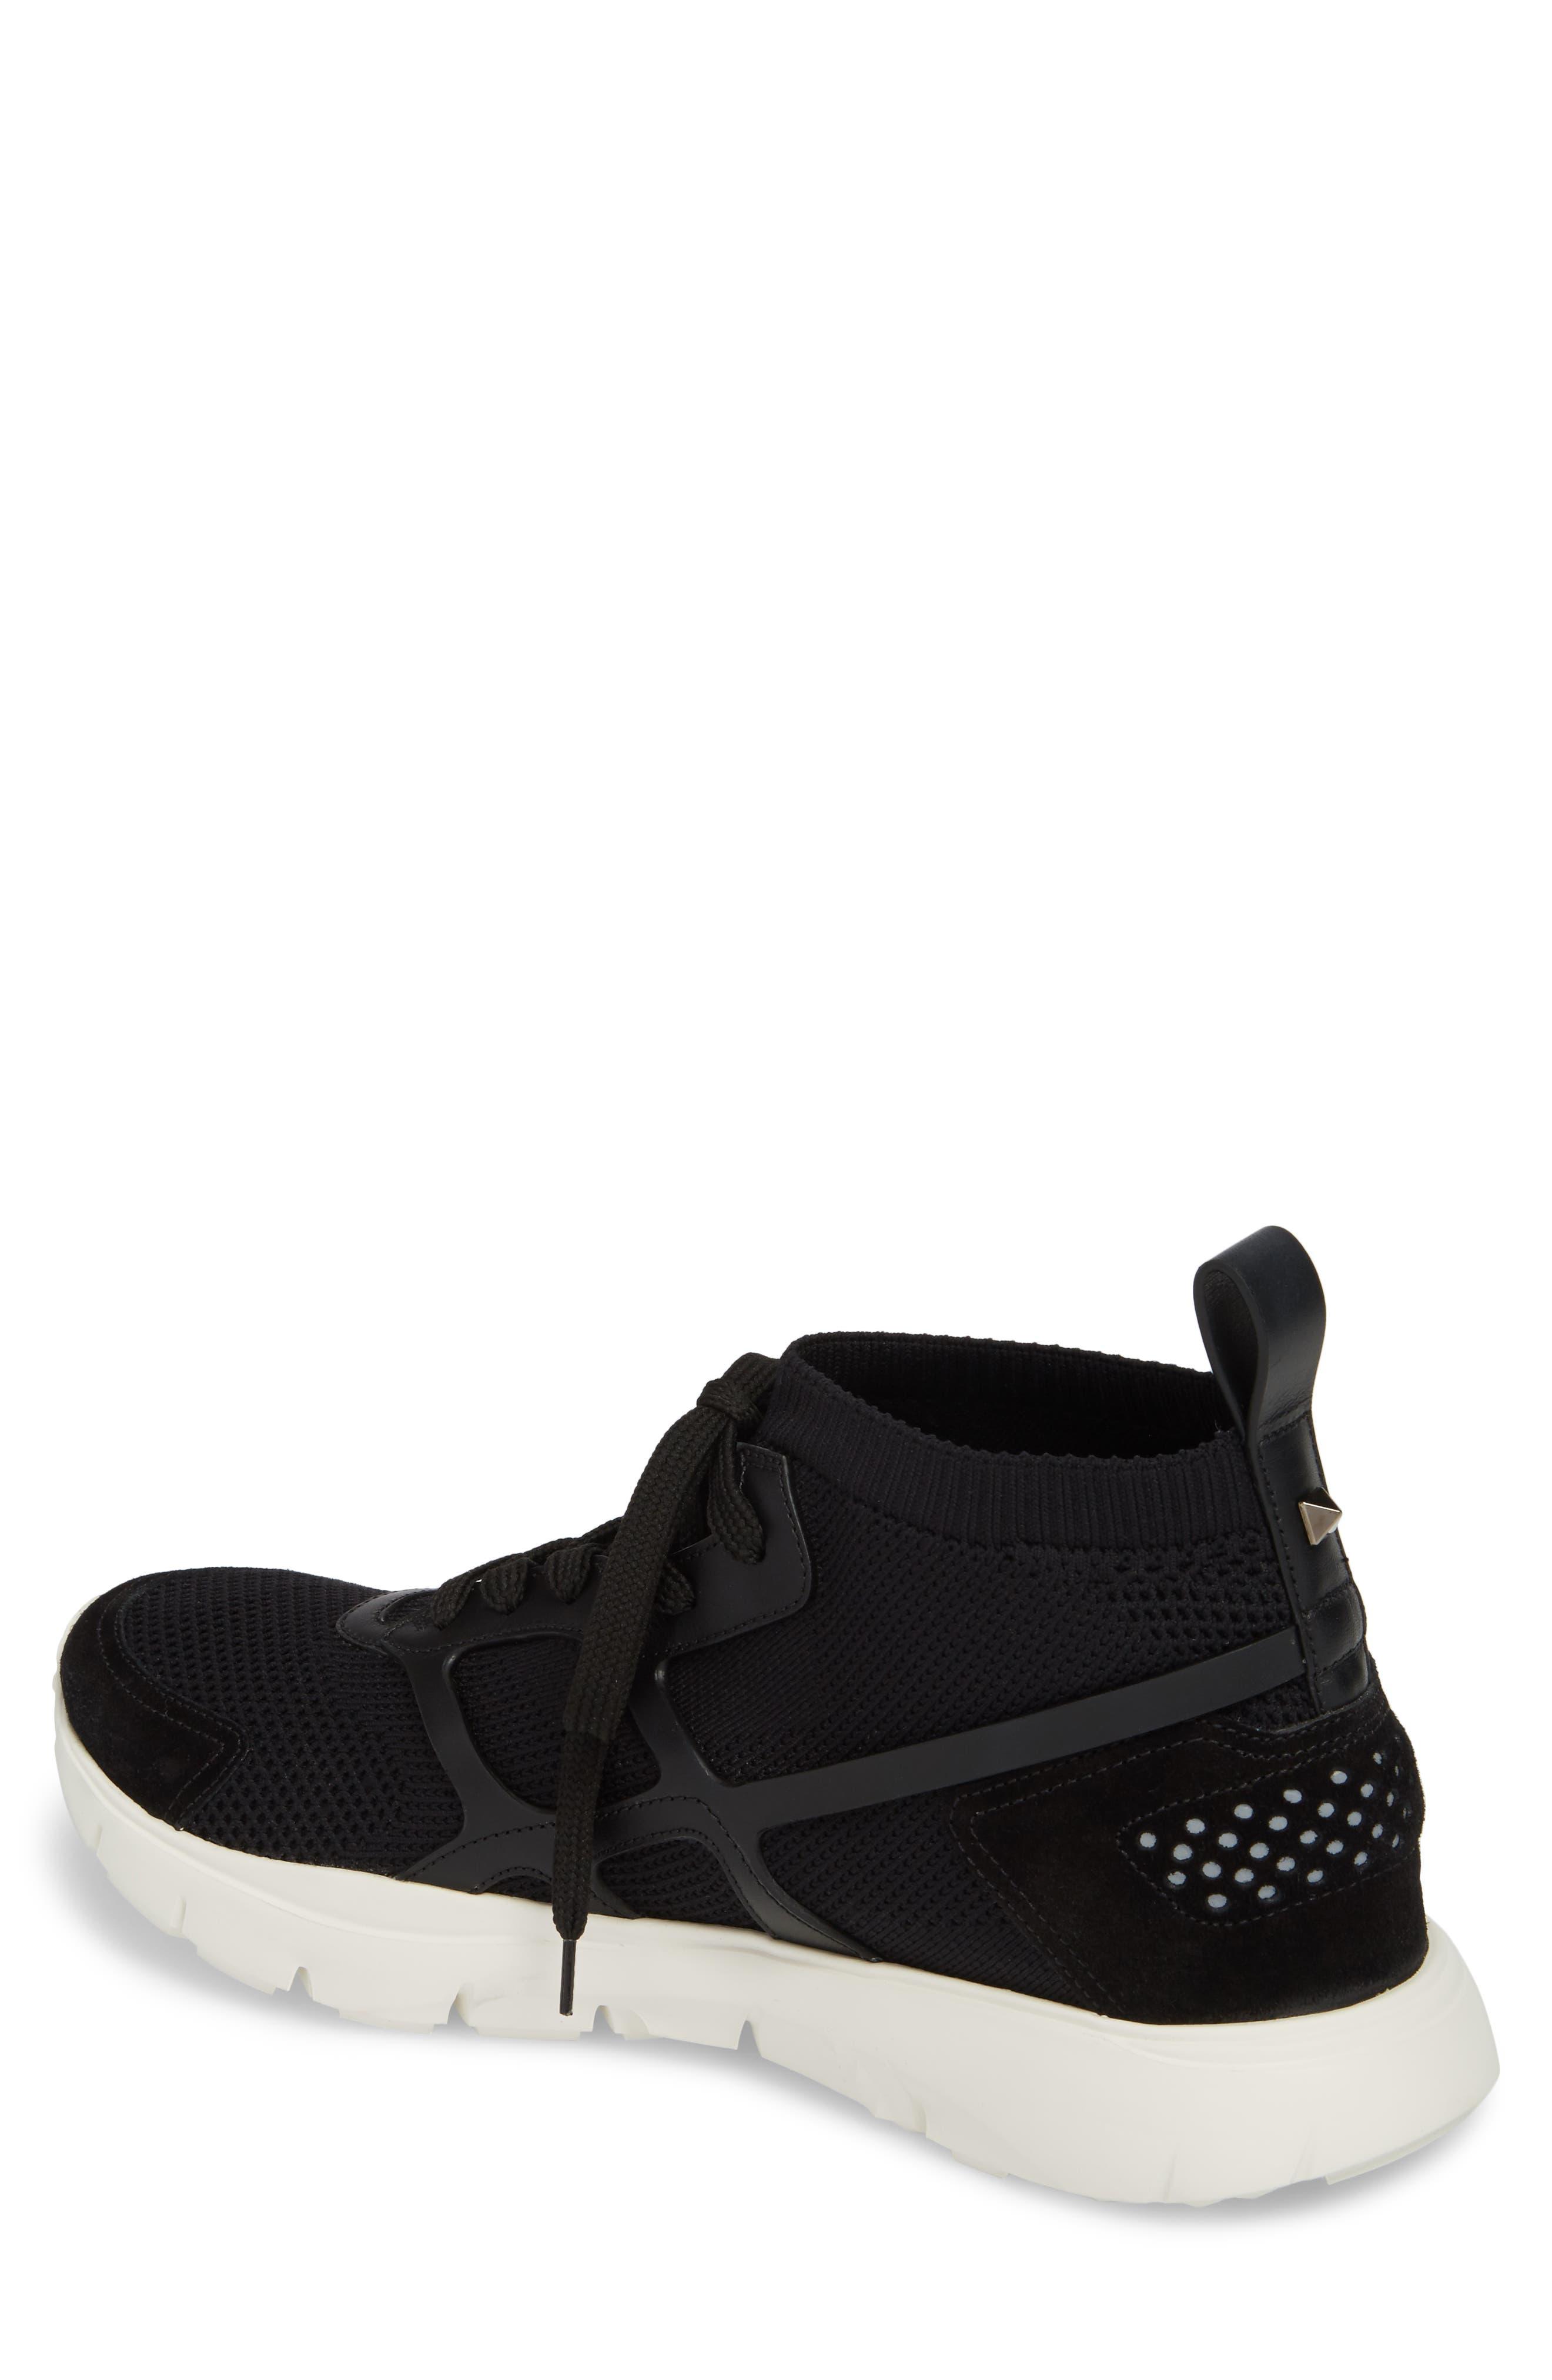 Sound High Sneaker,                             Alternate thumbnail 2, color,                             Nero